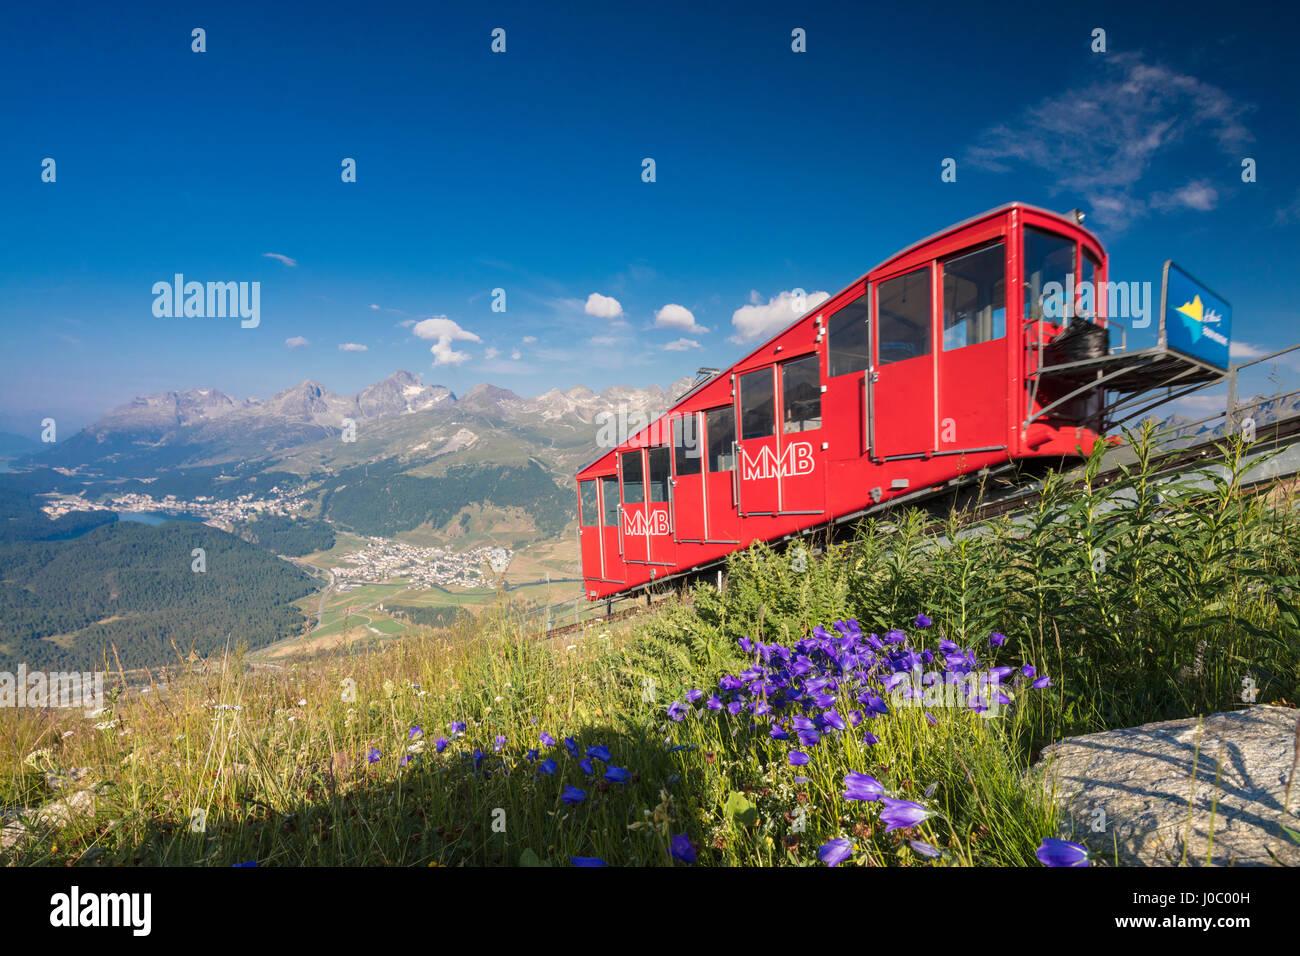 Le funiculaire qui traverse les prairies alpines, Muottas Muragl, Samedan, Canton des Grisons, Engadine, Suisse Photo Stock